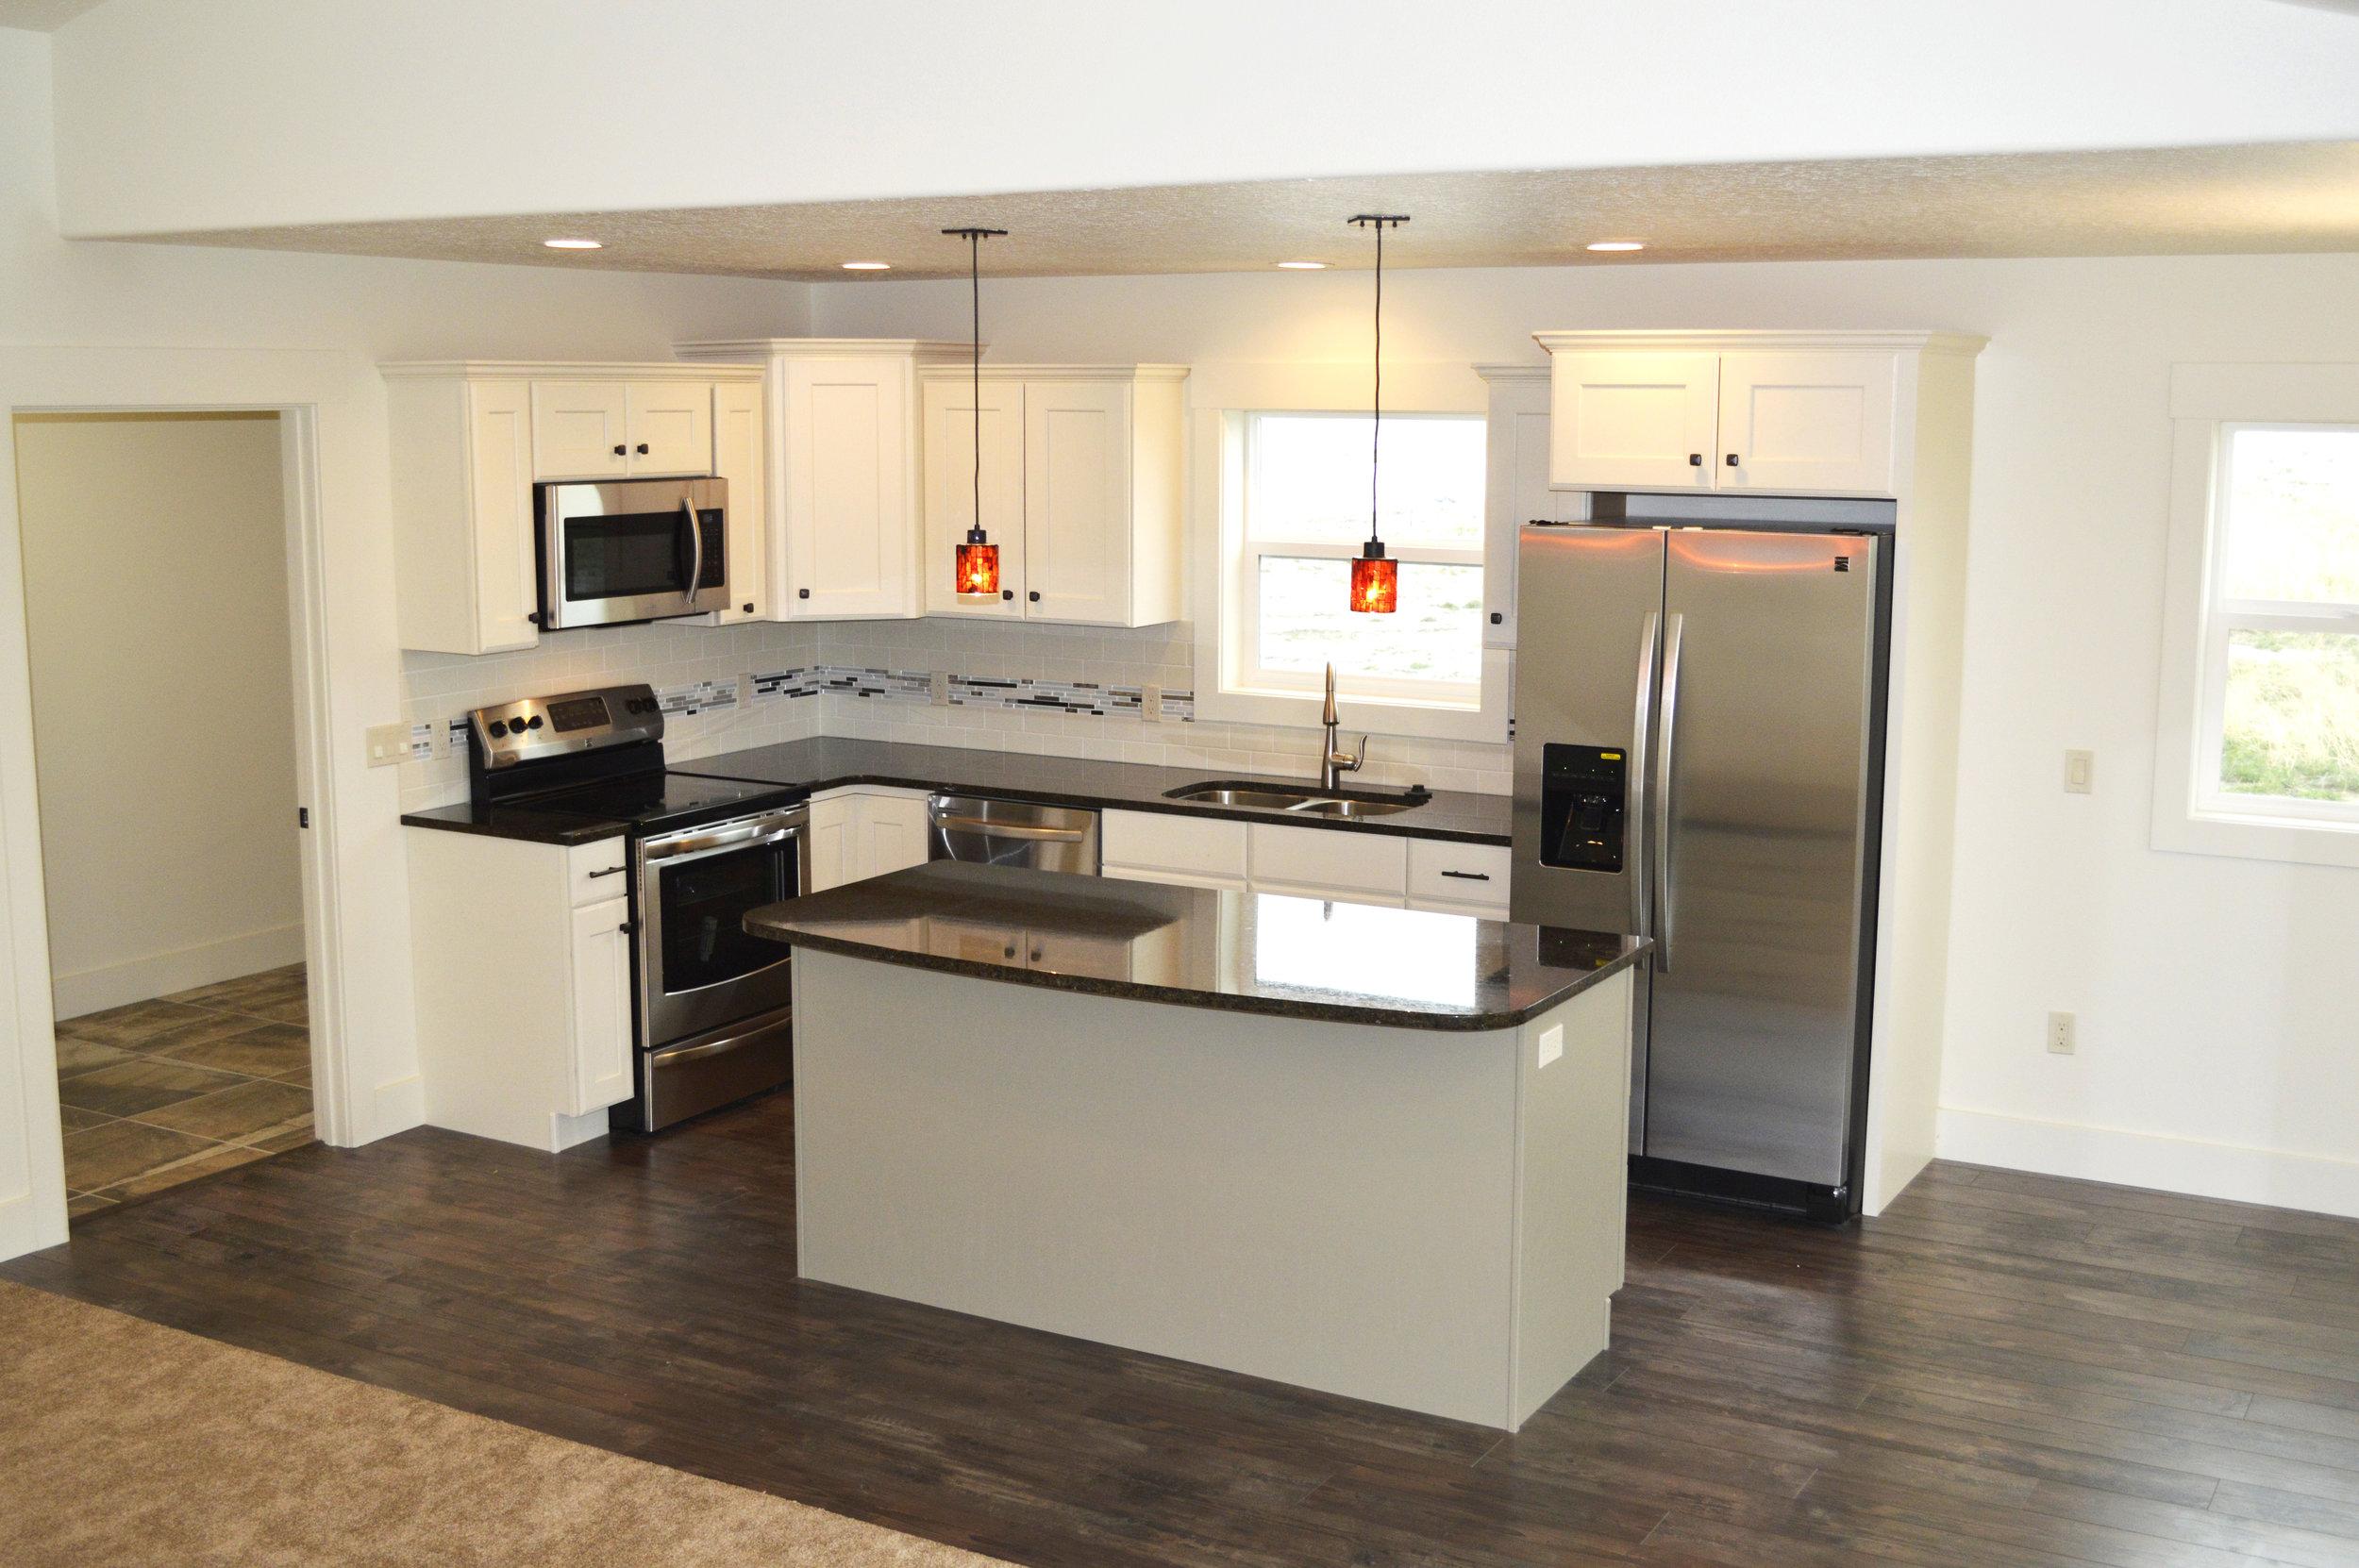 Model_home_kitchen.jpg